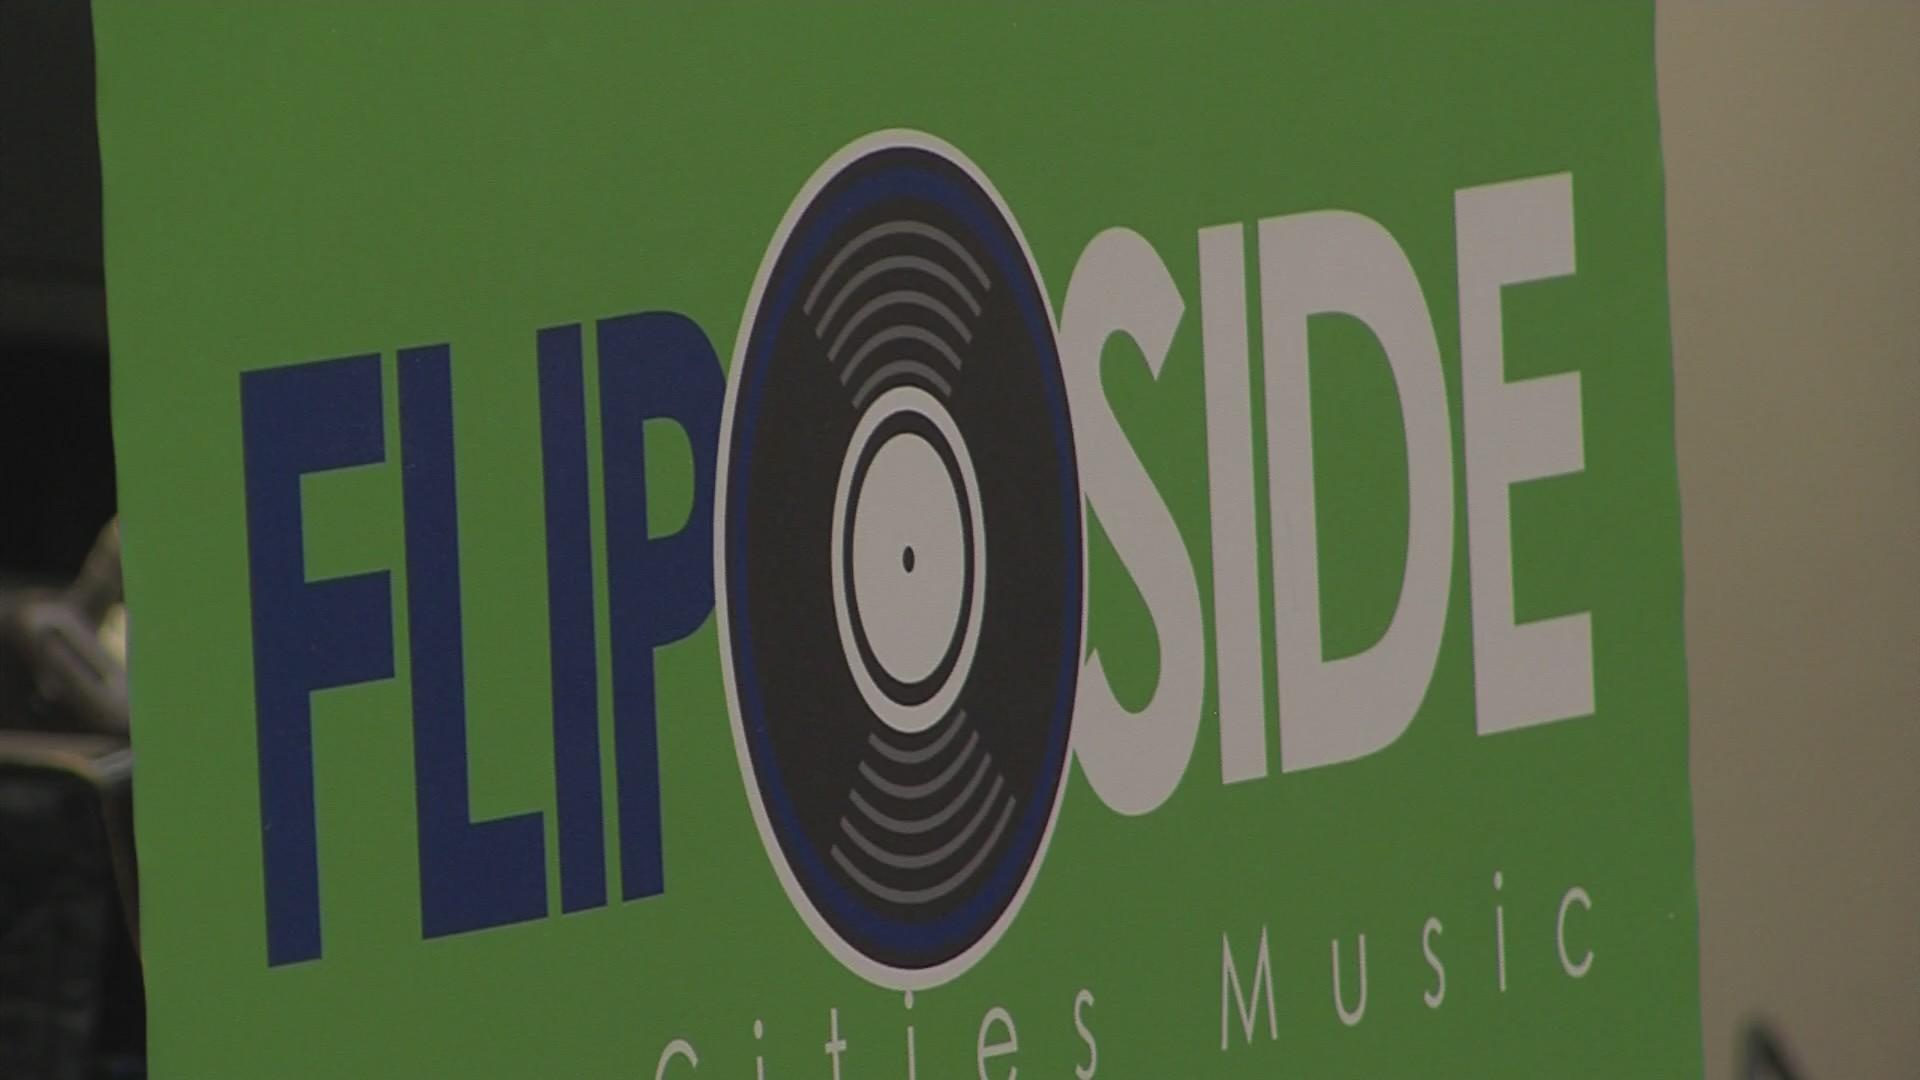 Flipside: Appleton Public Library